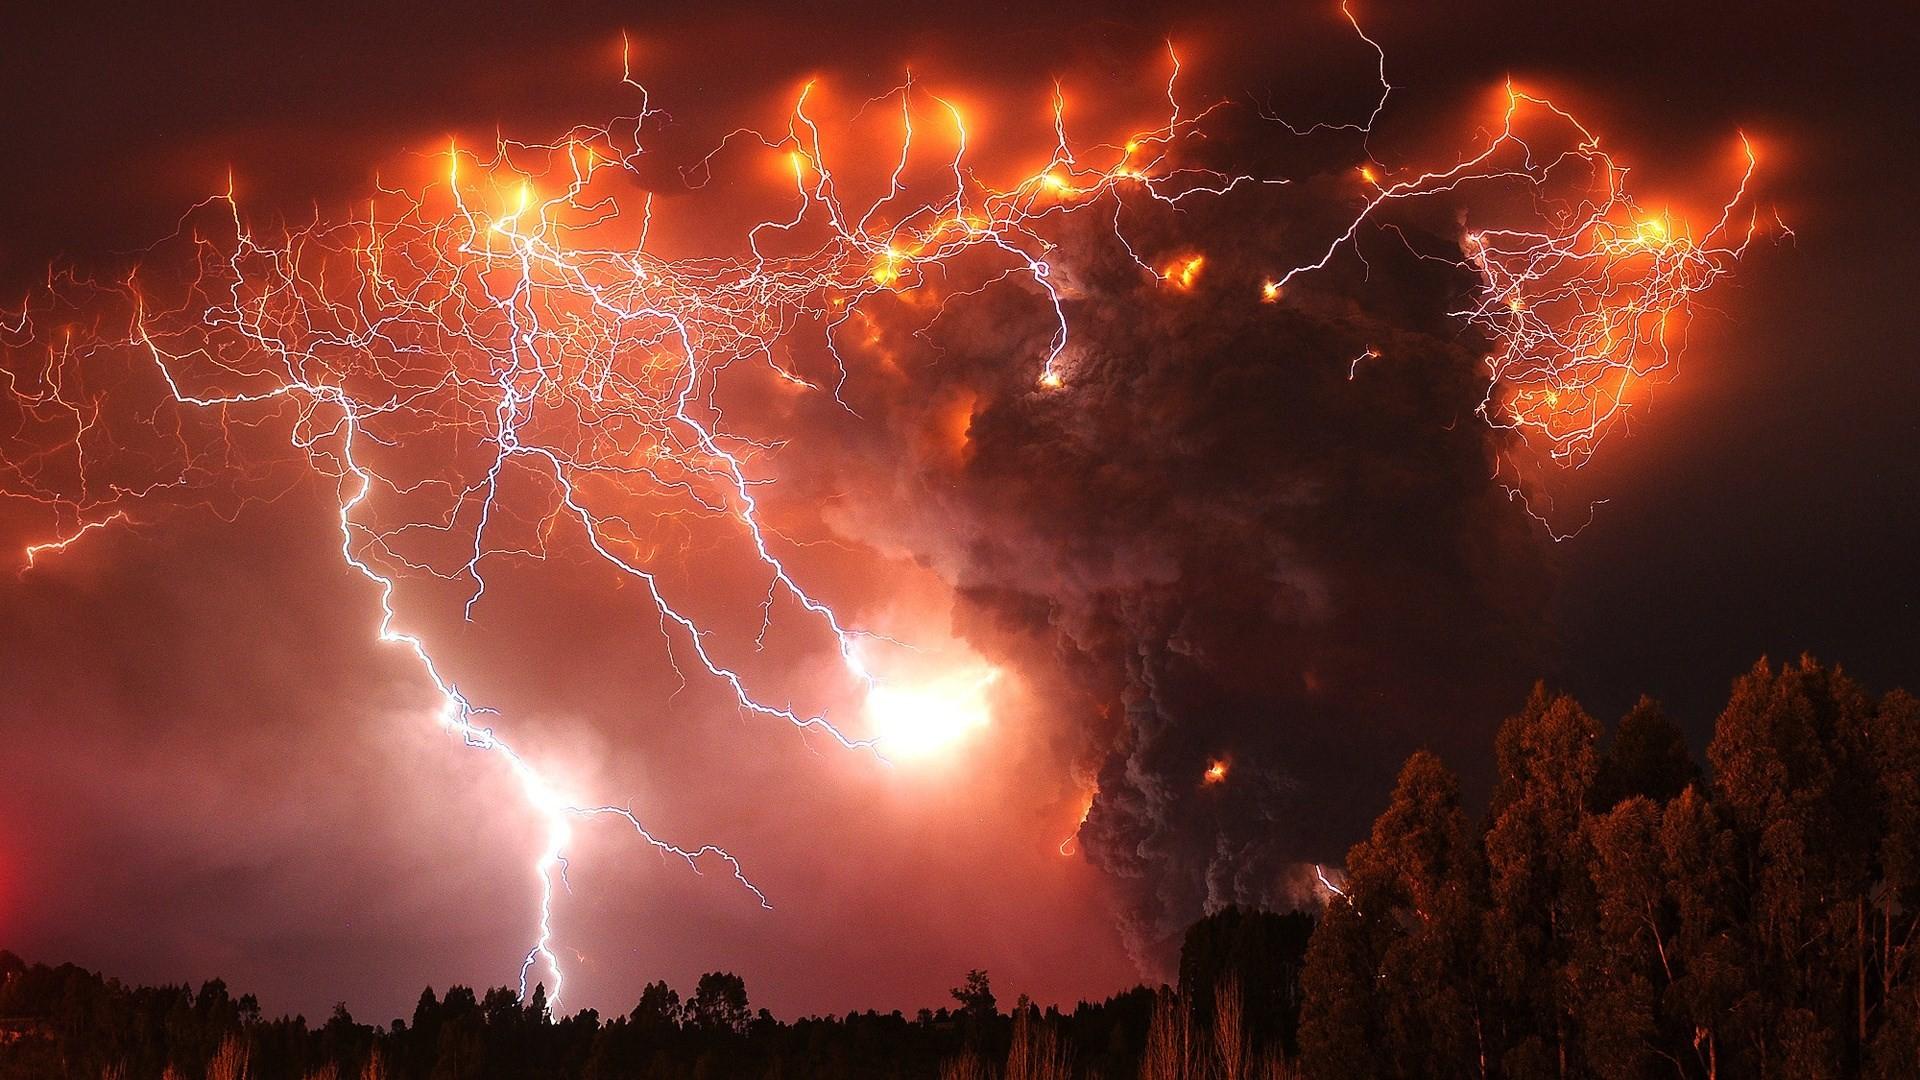 sky lightning storm wallpapers 1920×1080